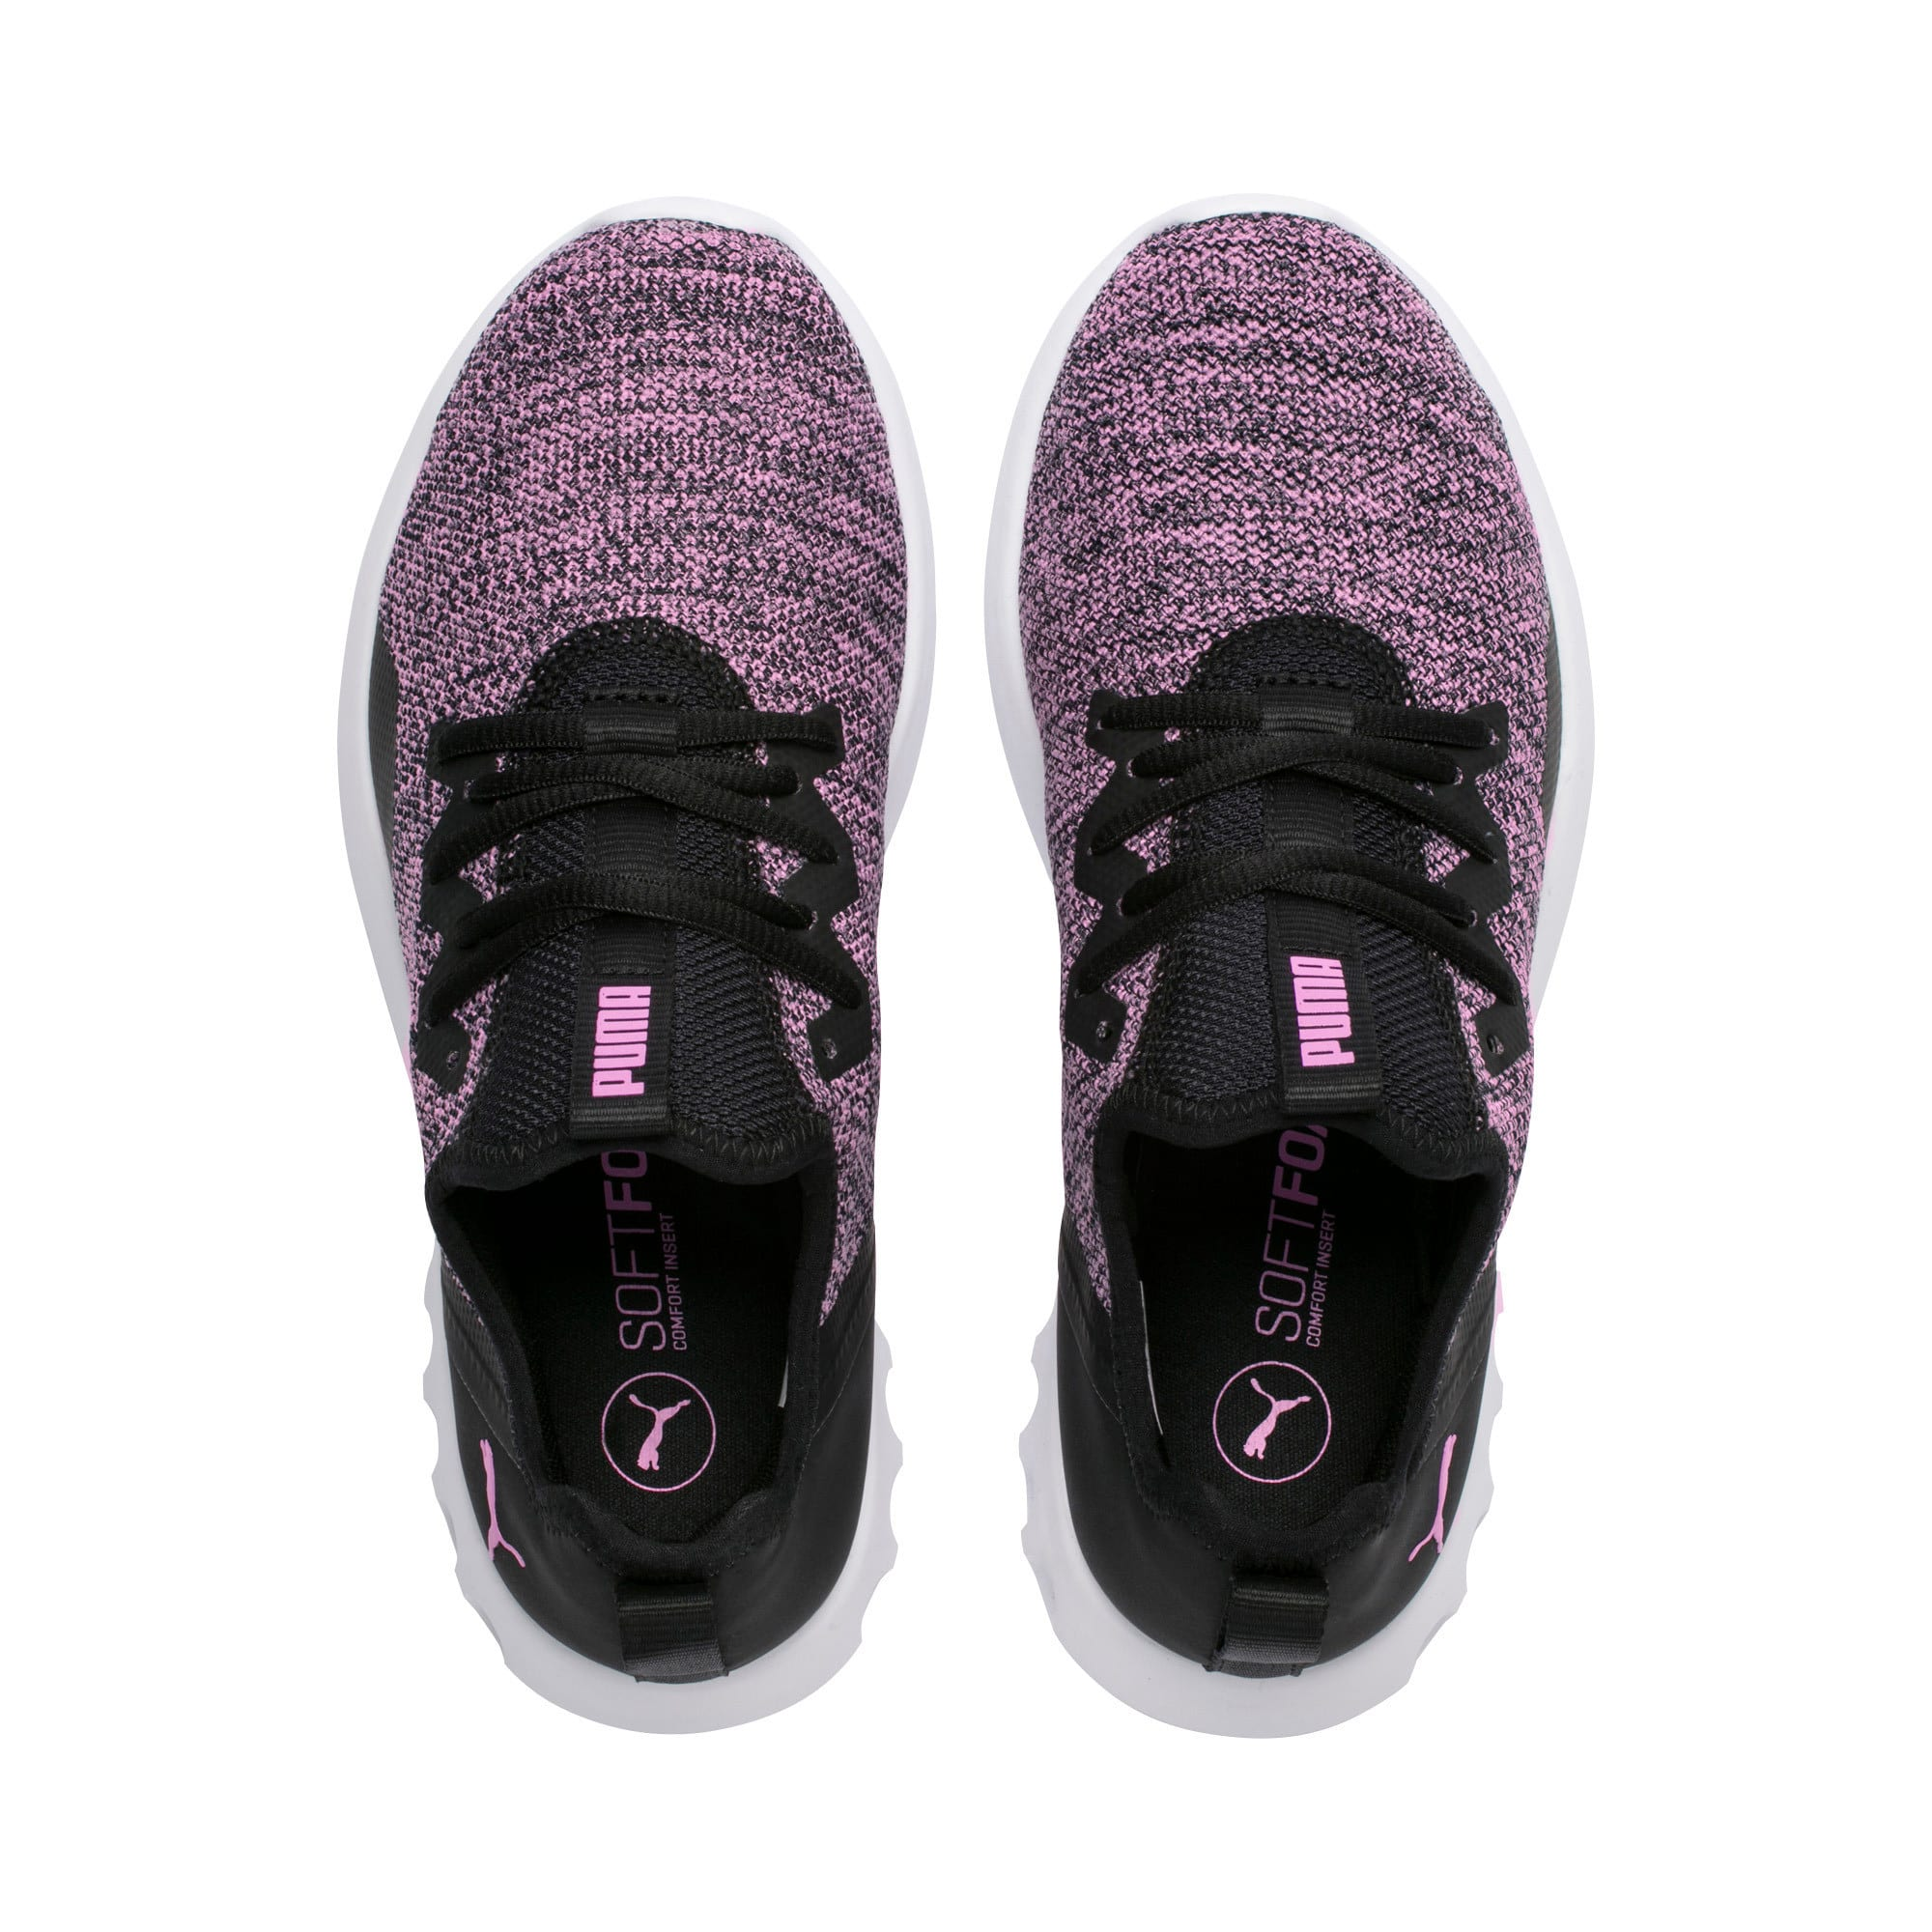 Thumbnail 4 of Carson 2 X Knit Women's Running Shoes, Puma Black-Orchid, medium